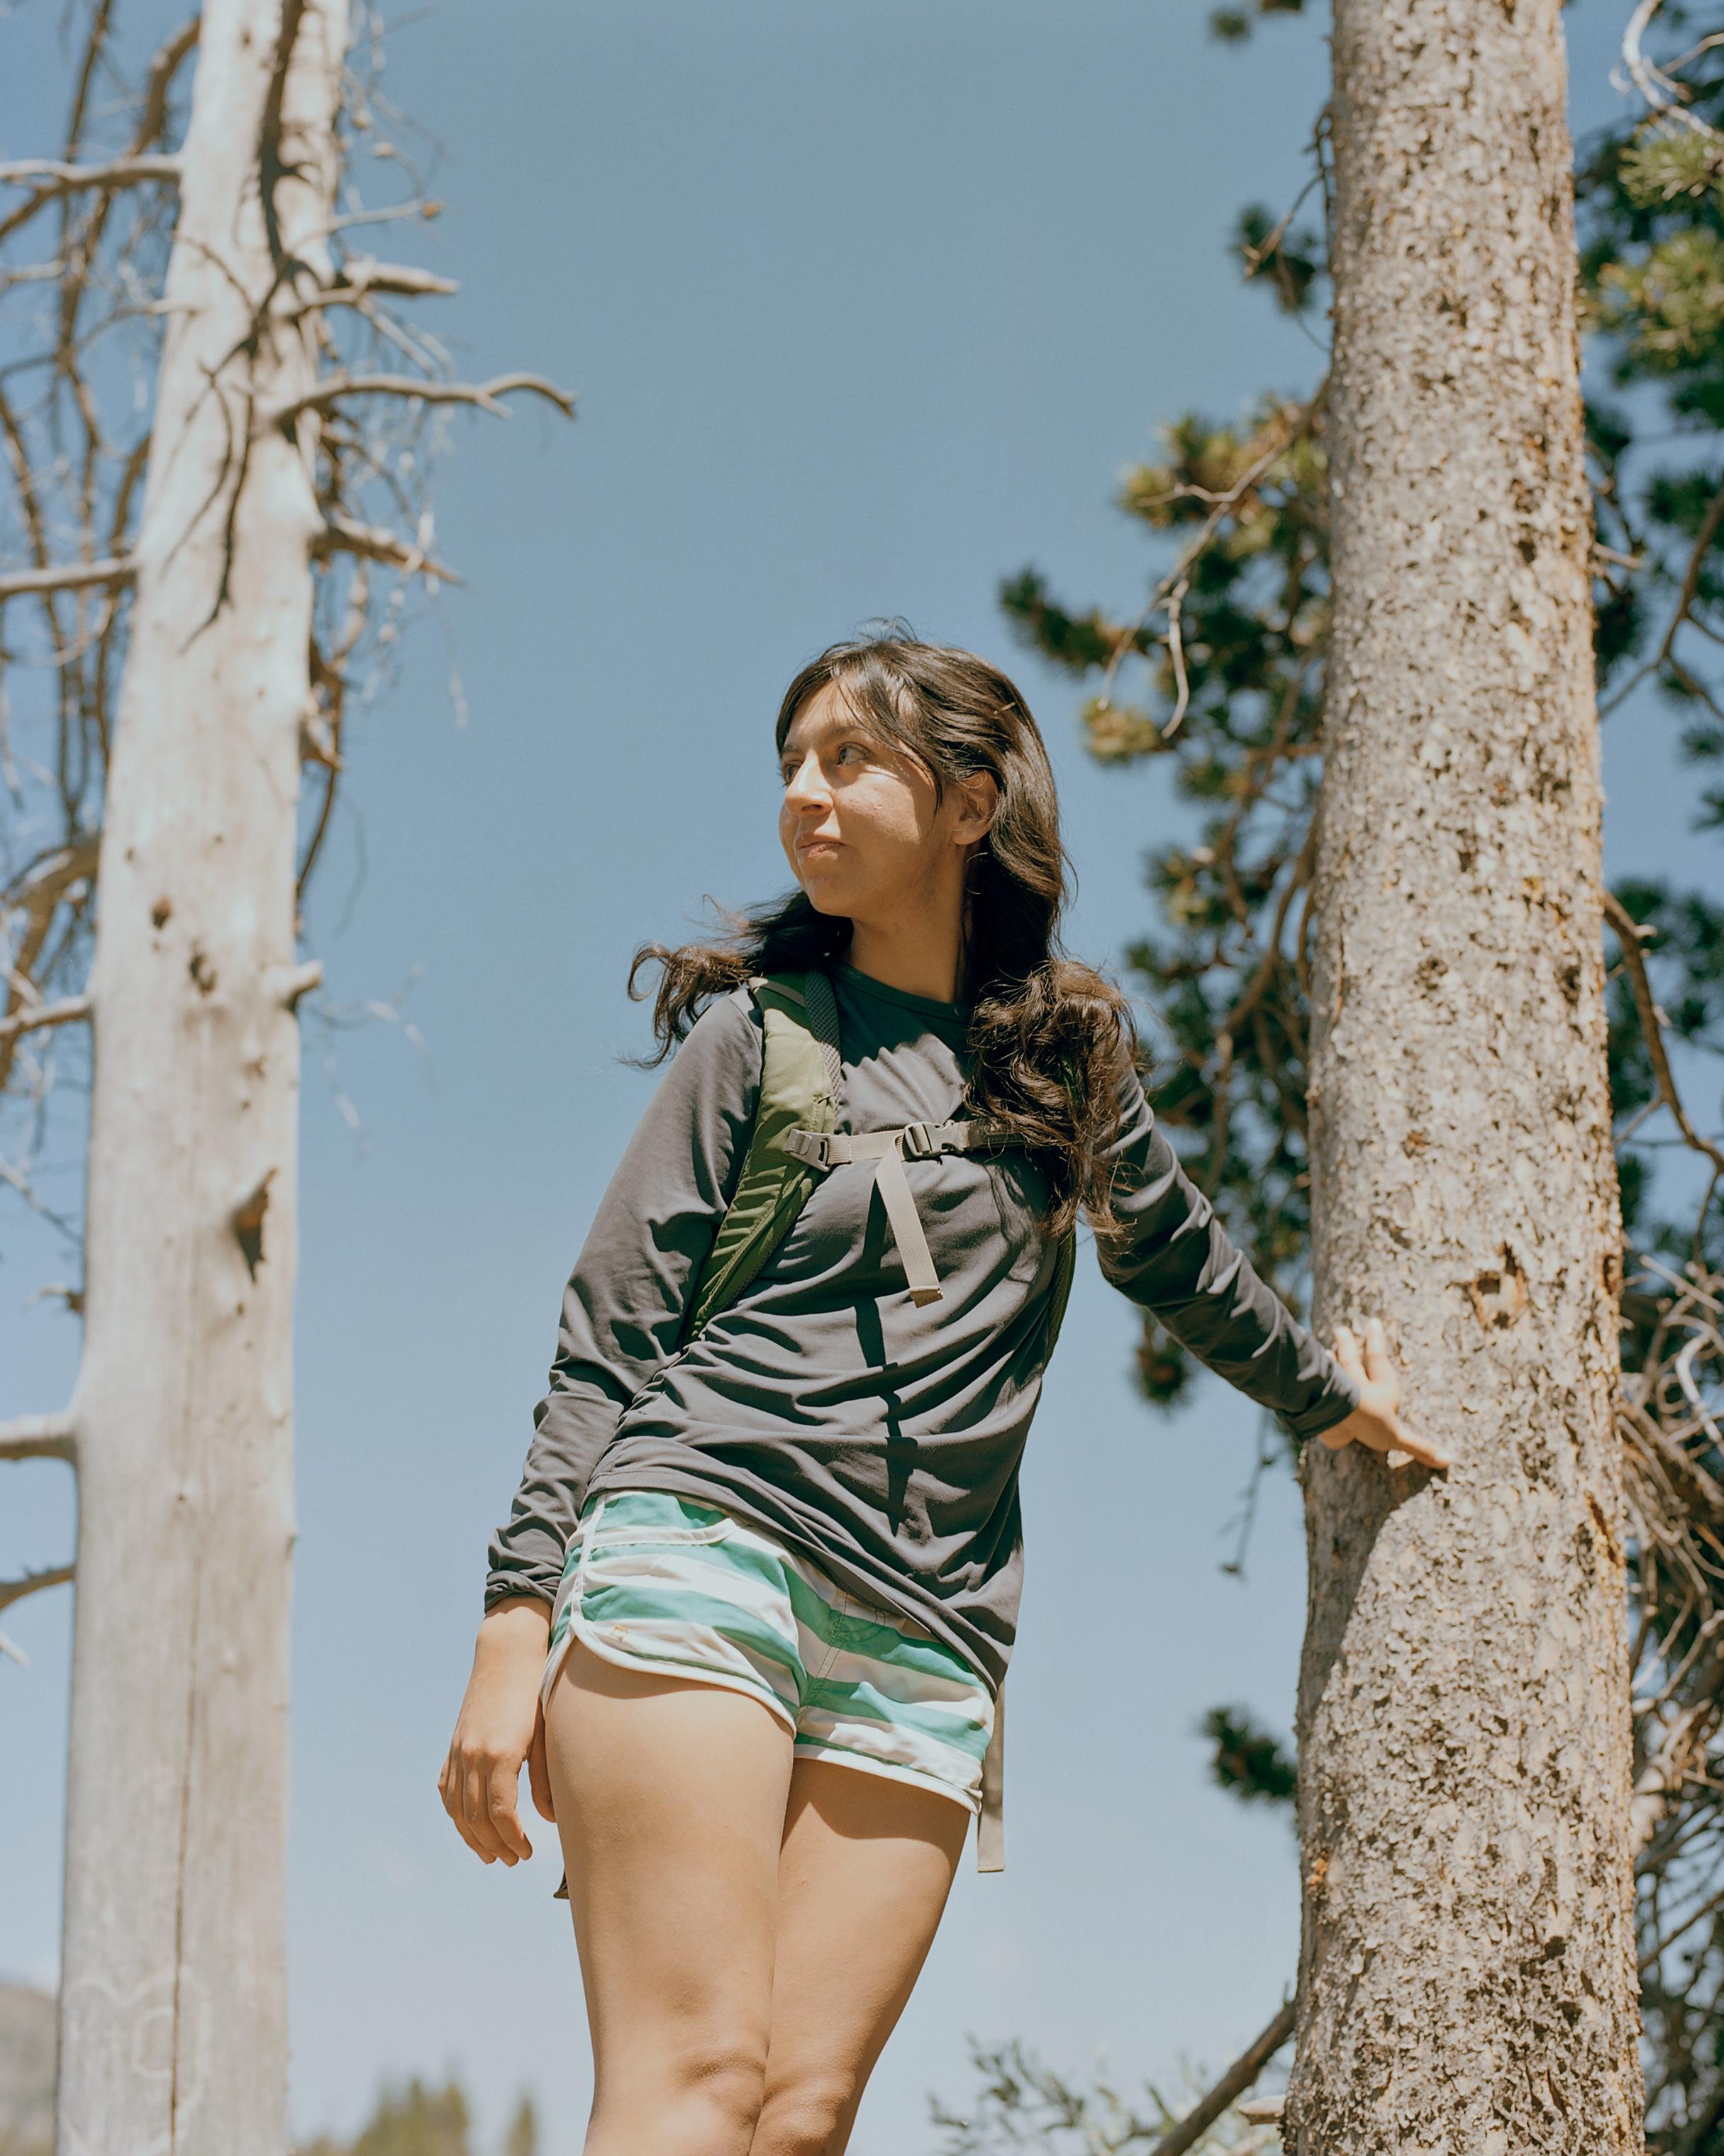 Bianca Garcia at Sprague Lake in Rocky Mountain National Park, June 29, 2018.